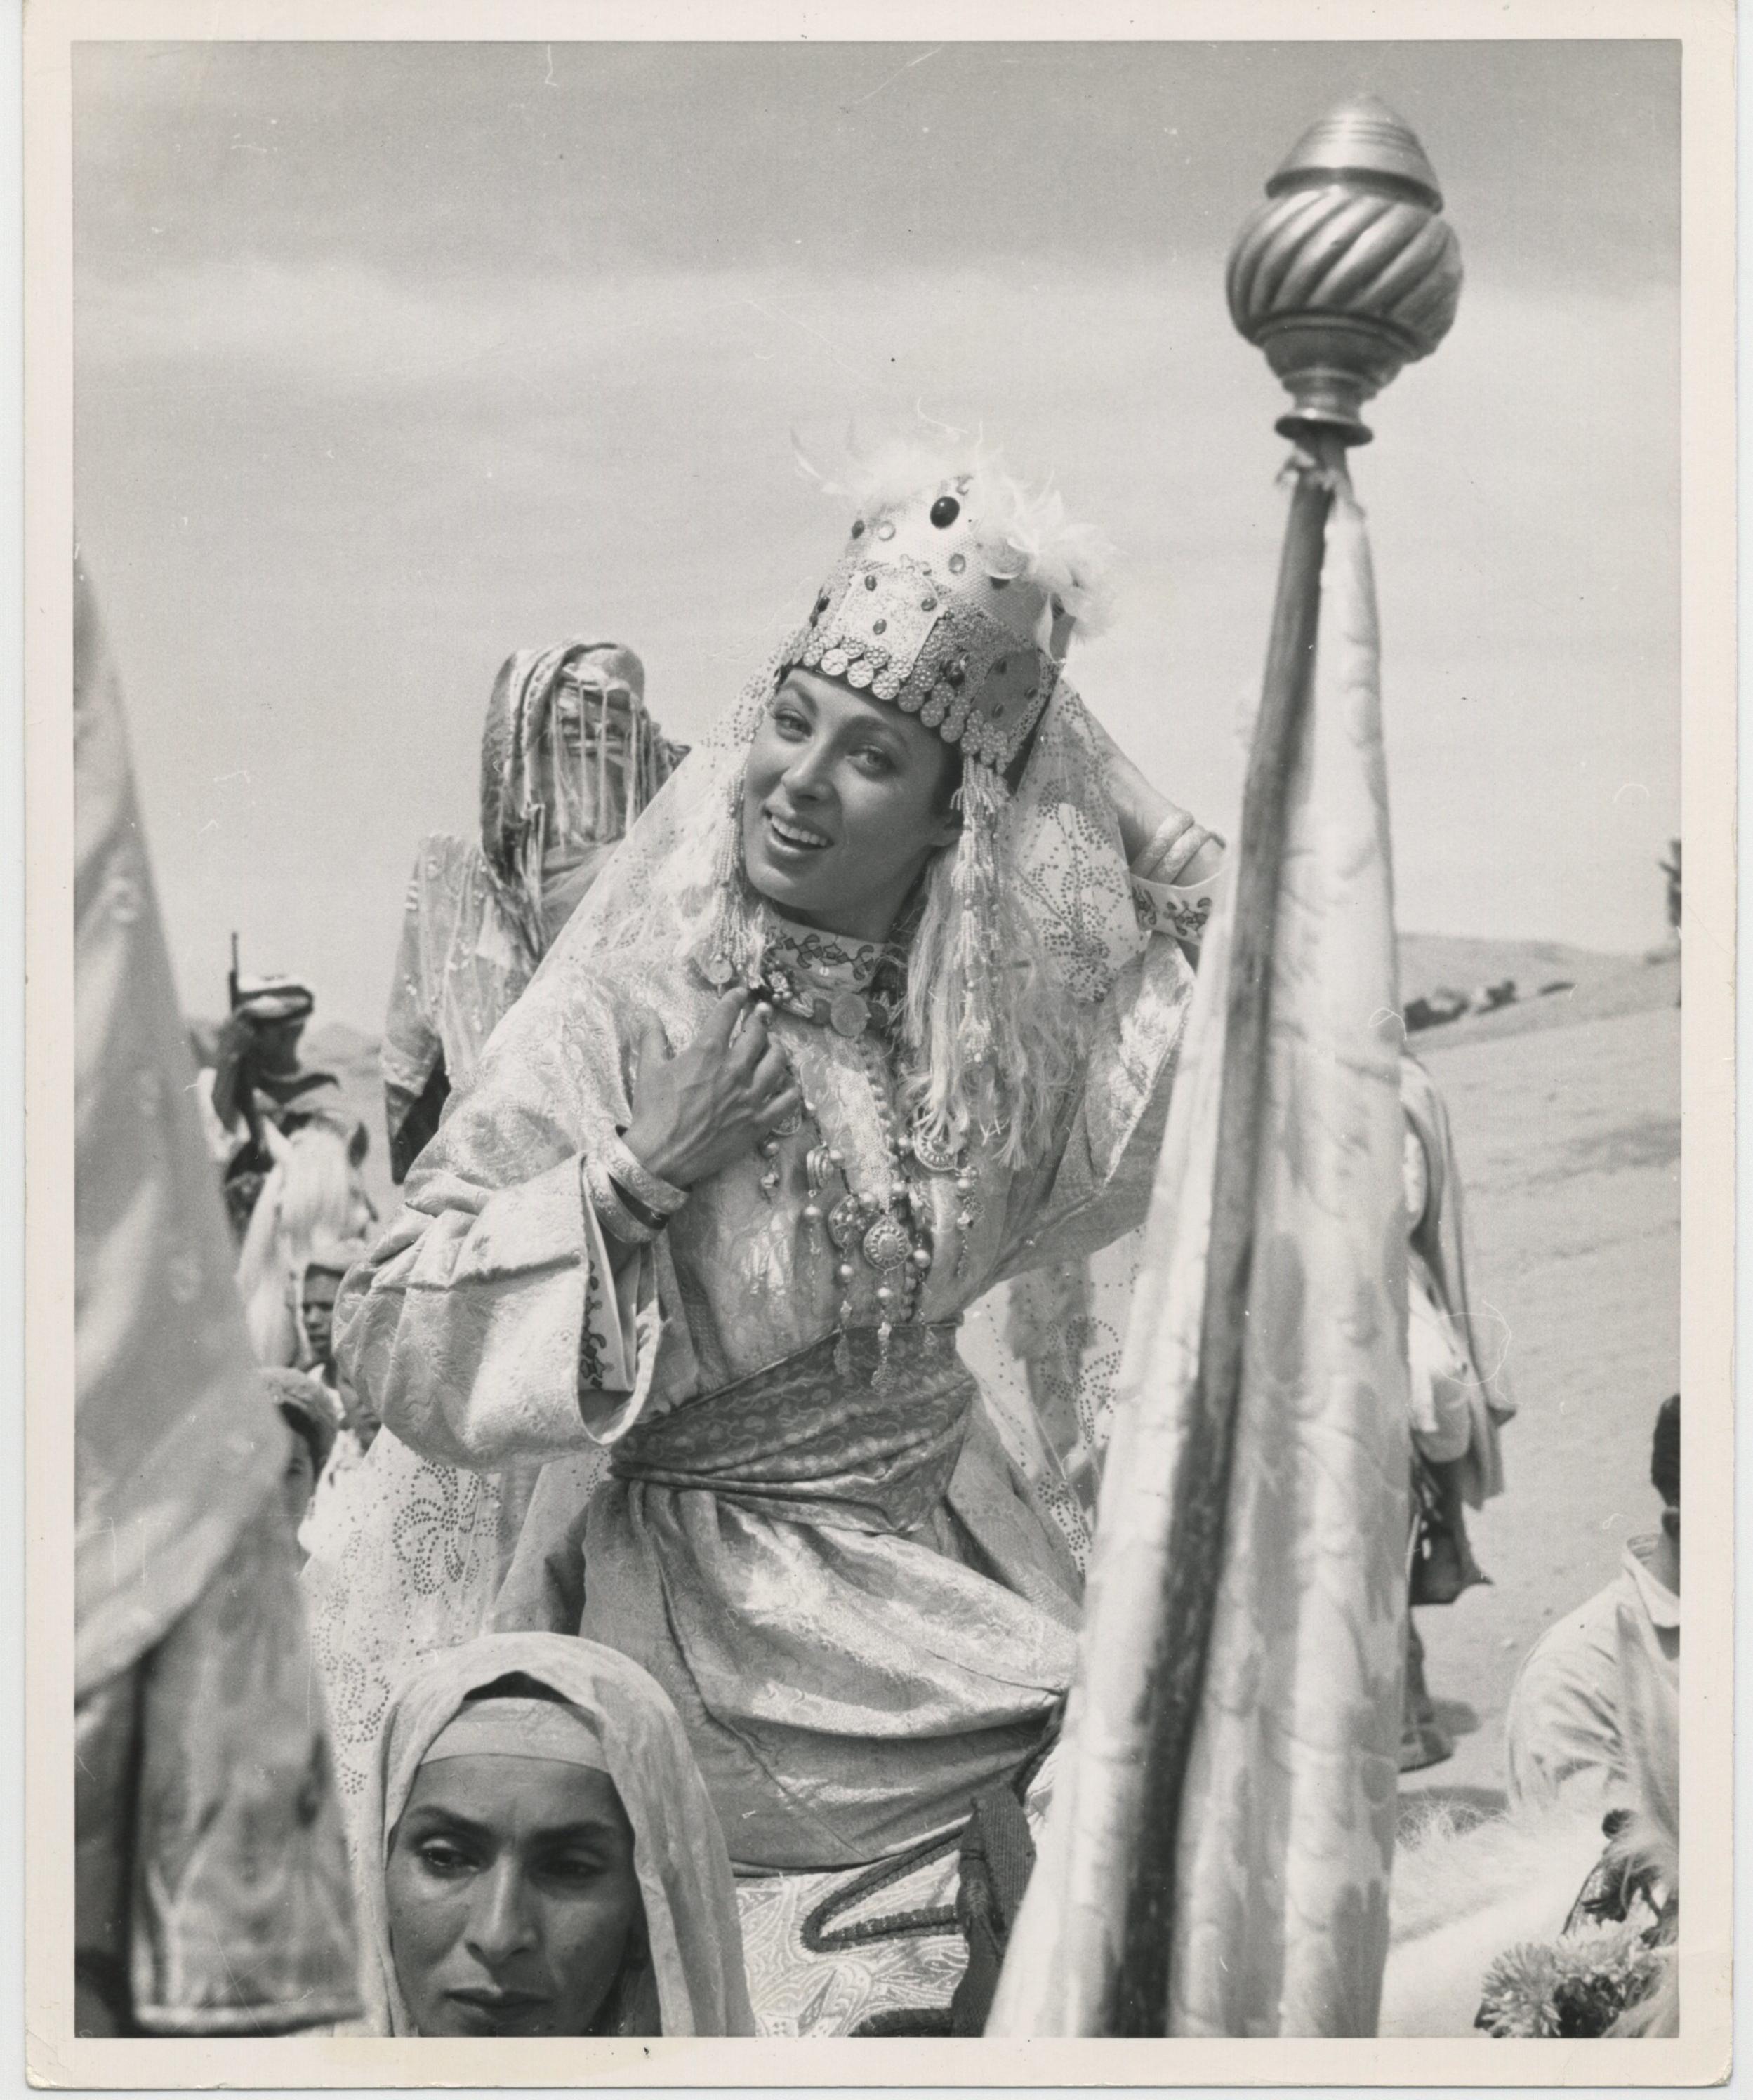 Rita Gam in Saadia (1953)